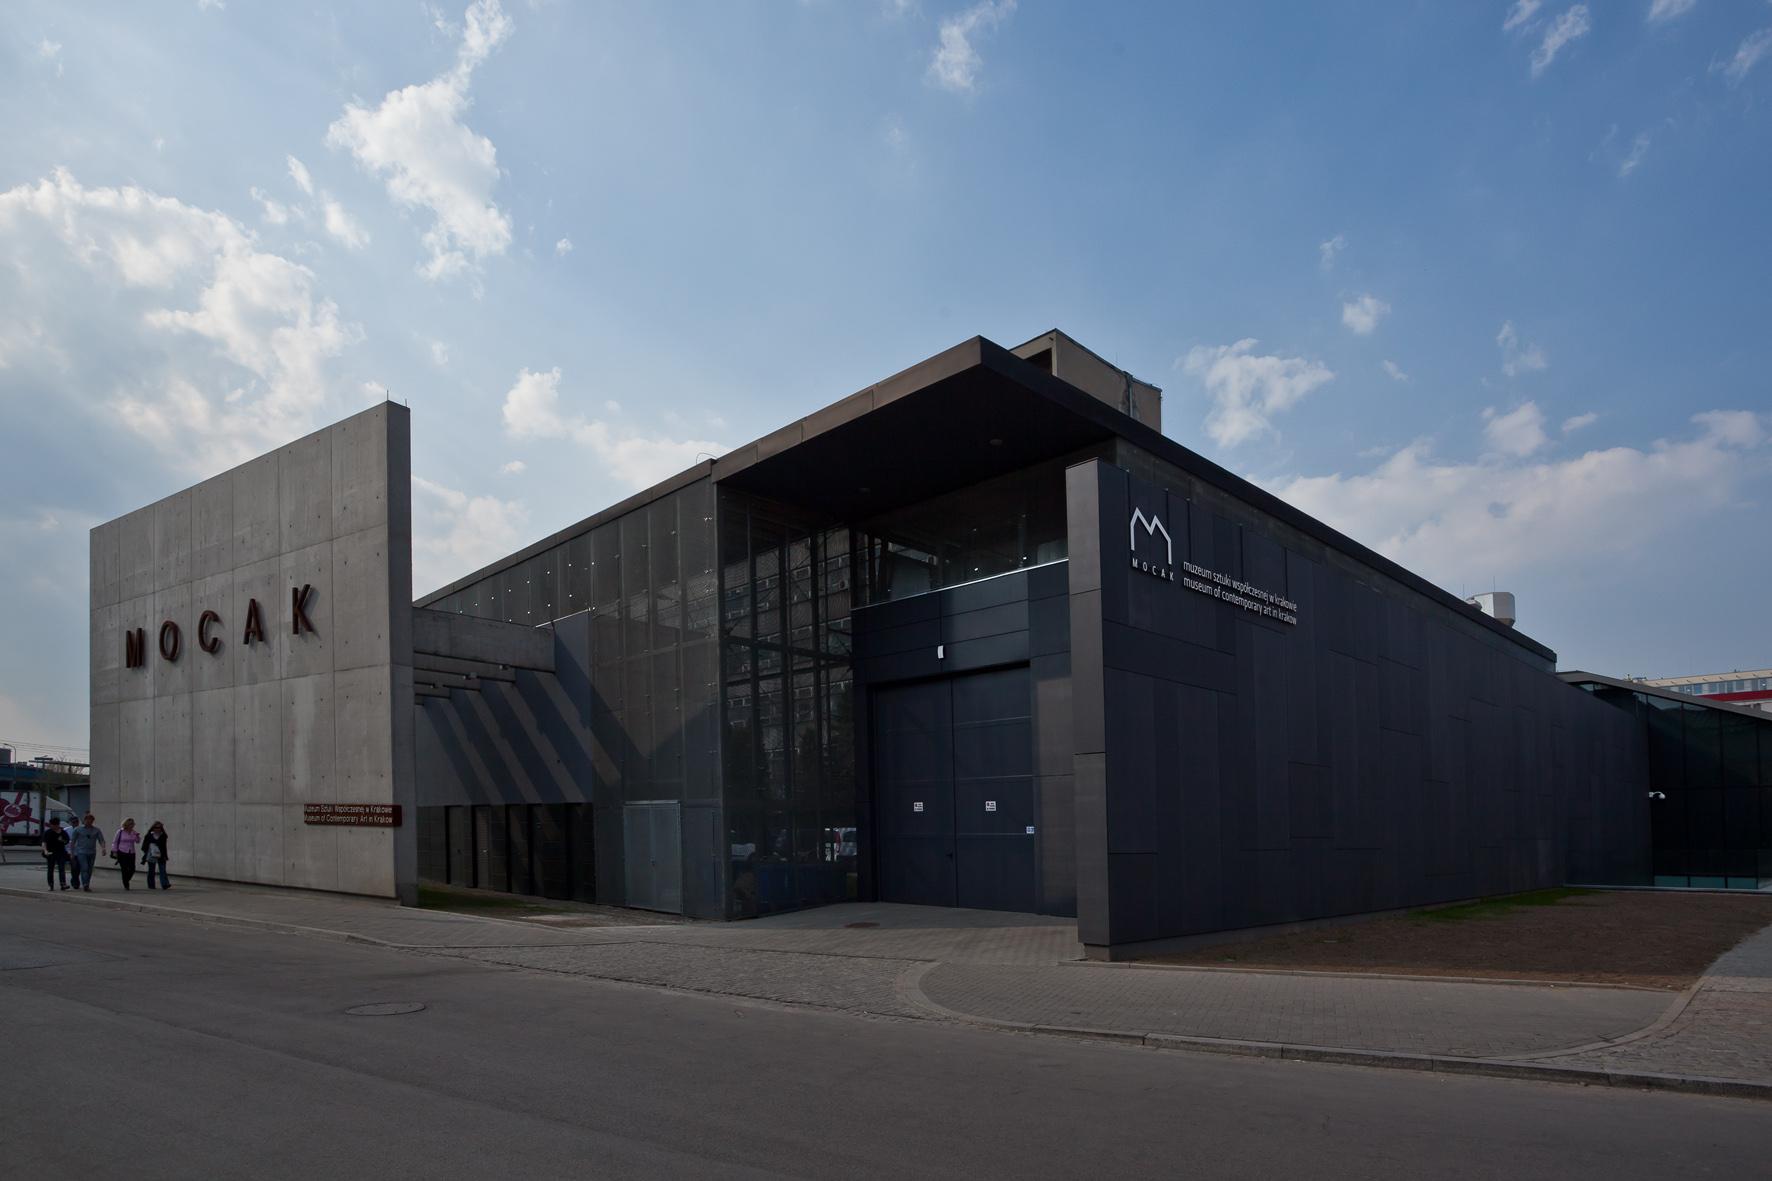 MOCAK the Museum of Contemporary Art in Krakow